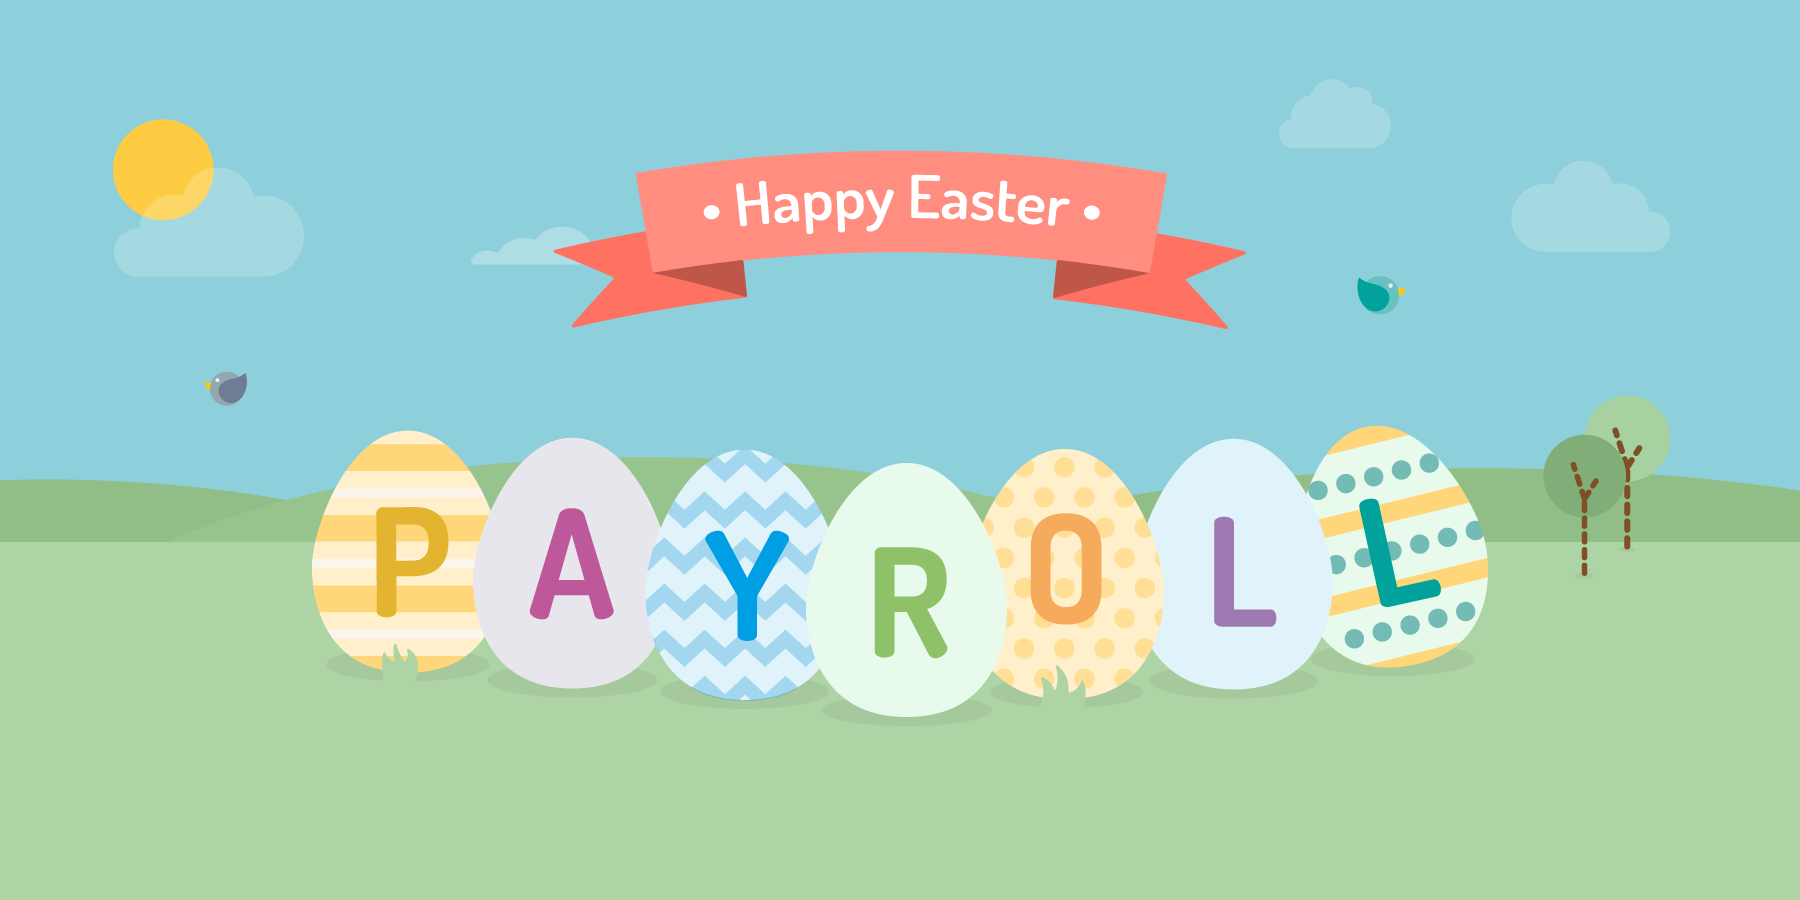 Easter payroll